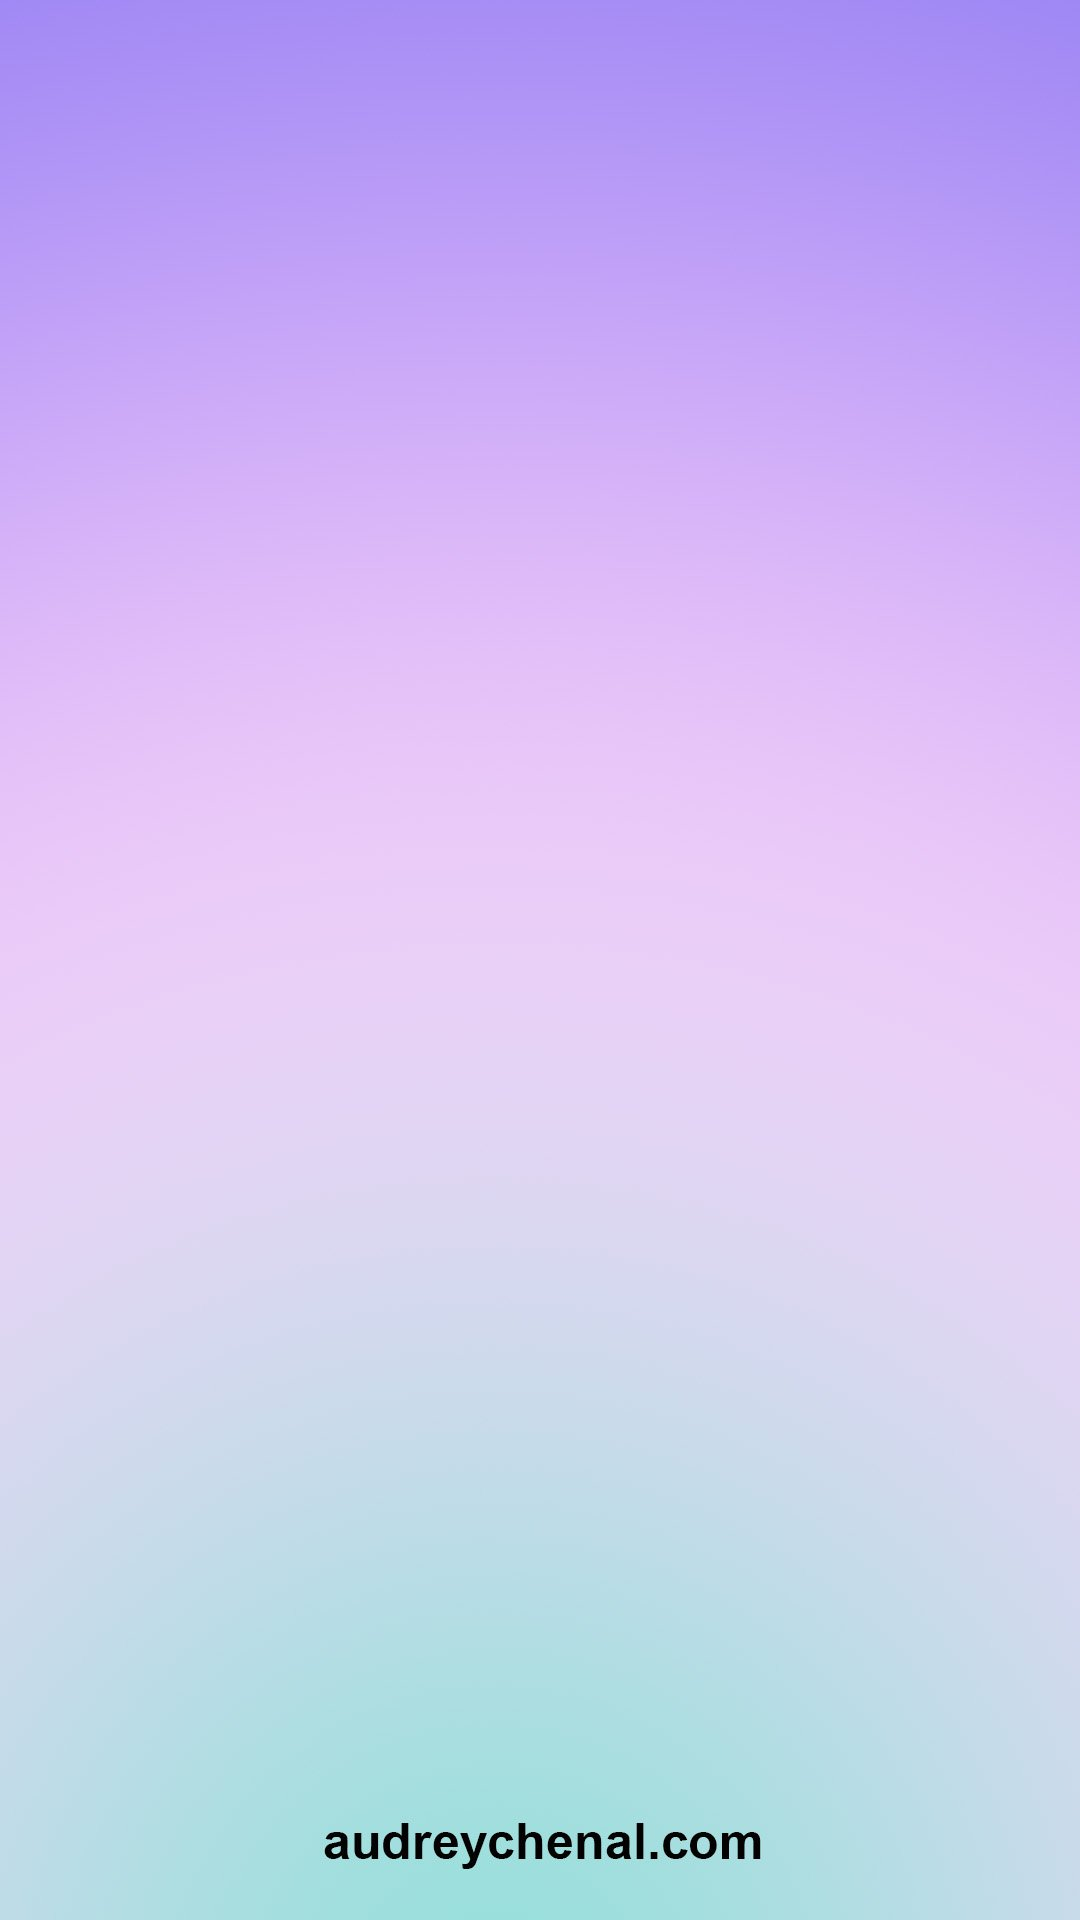 wallpaper irridescent purple blue turquoise gradient holographic